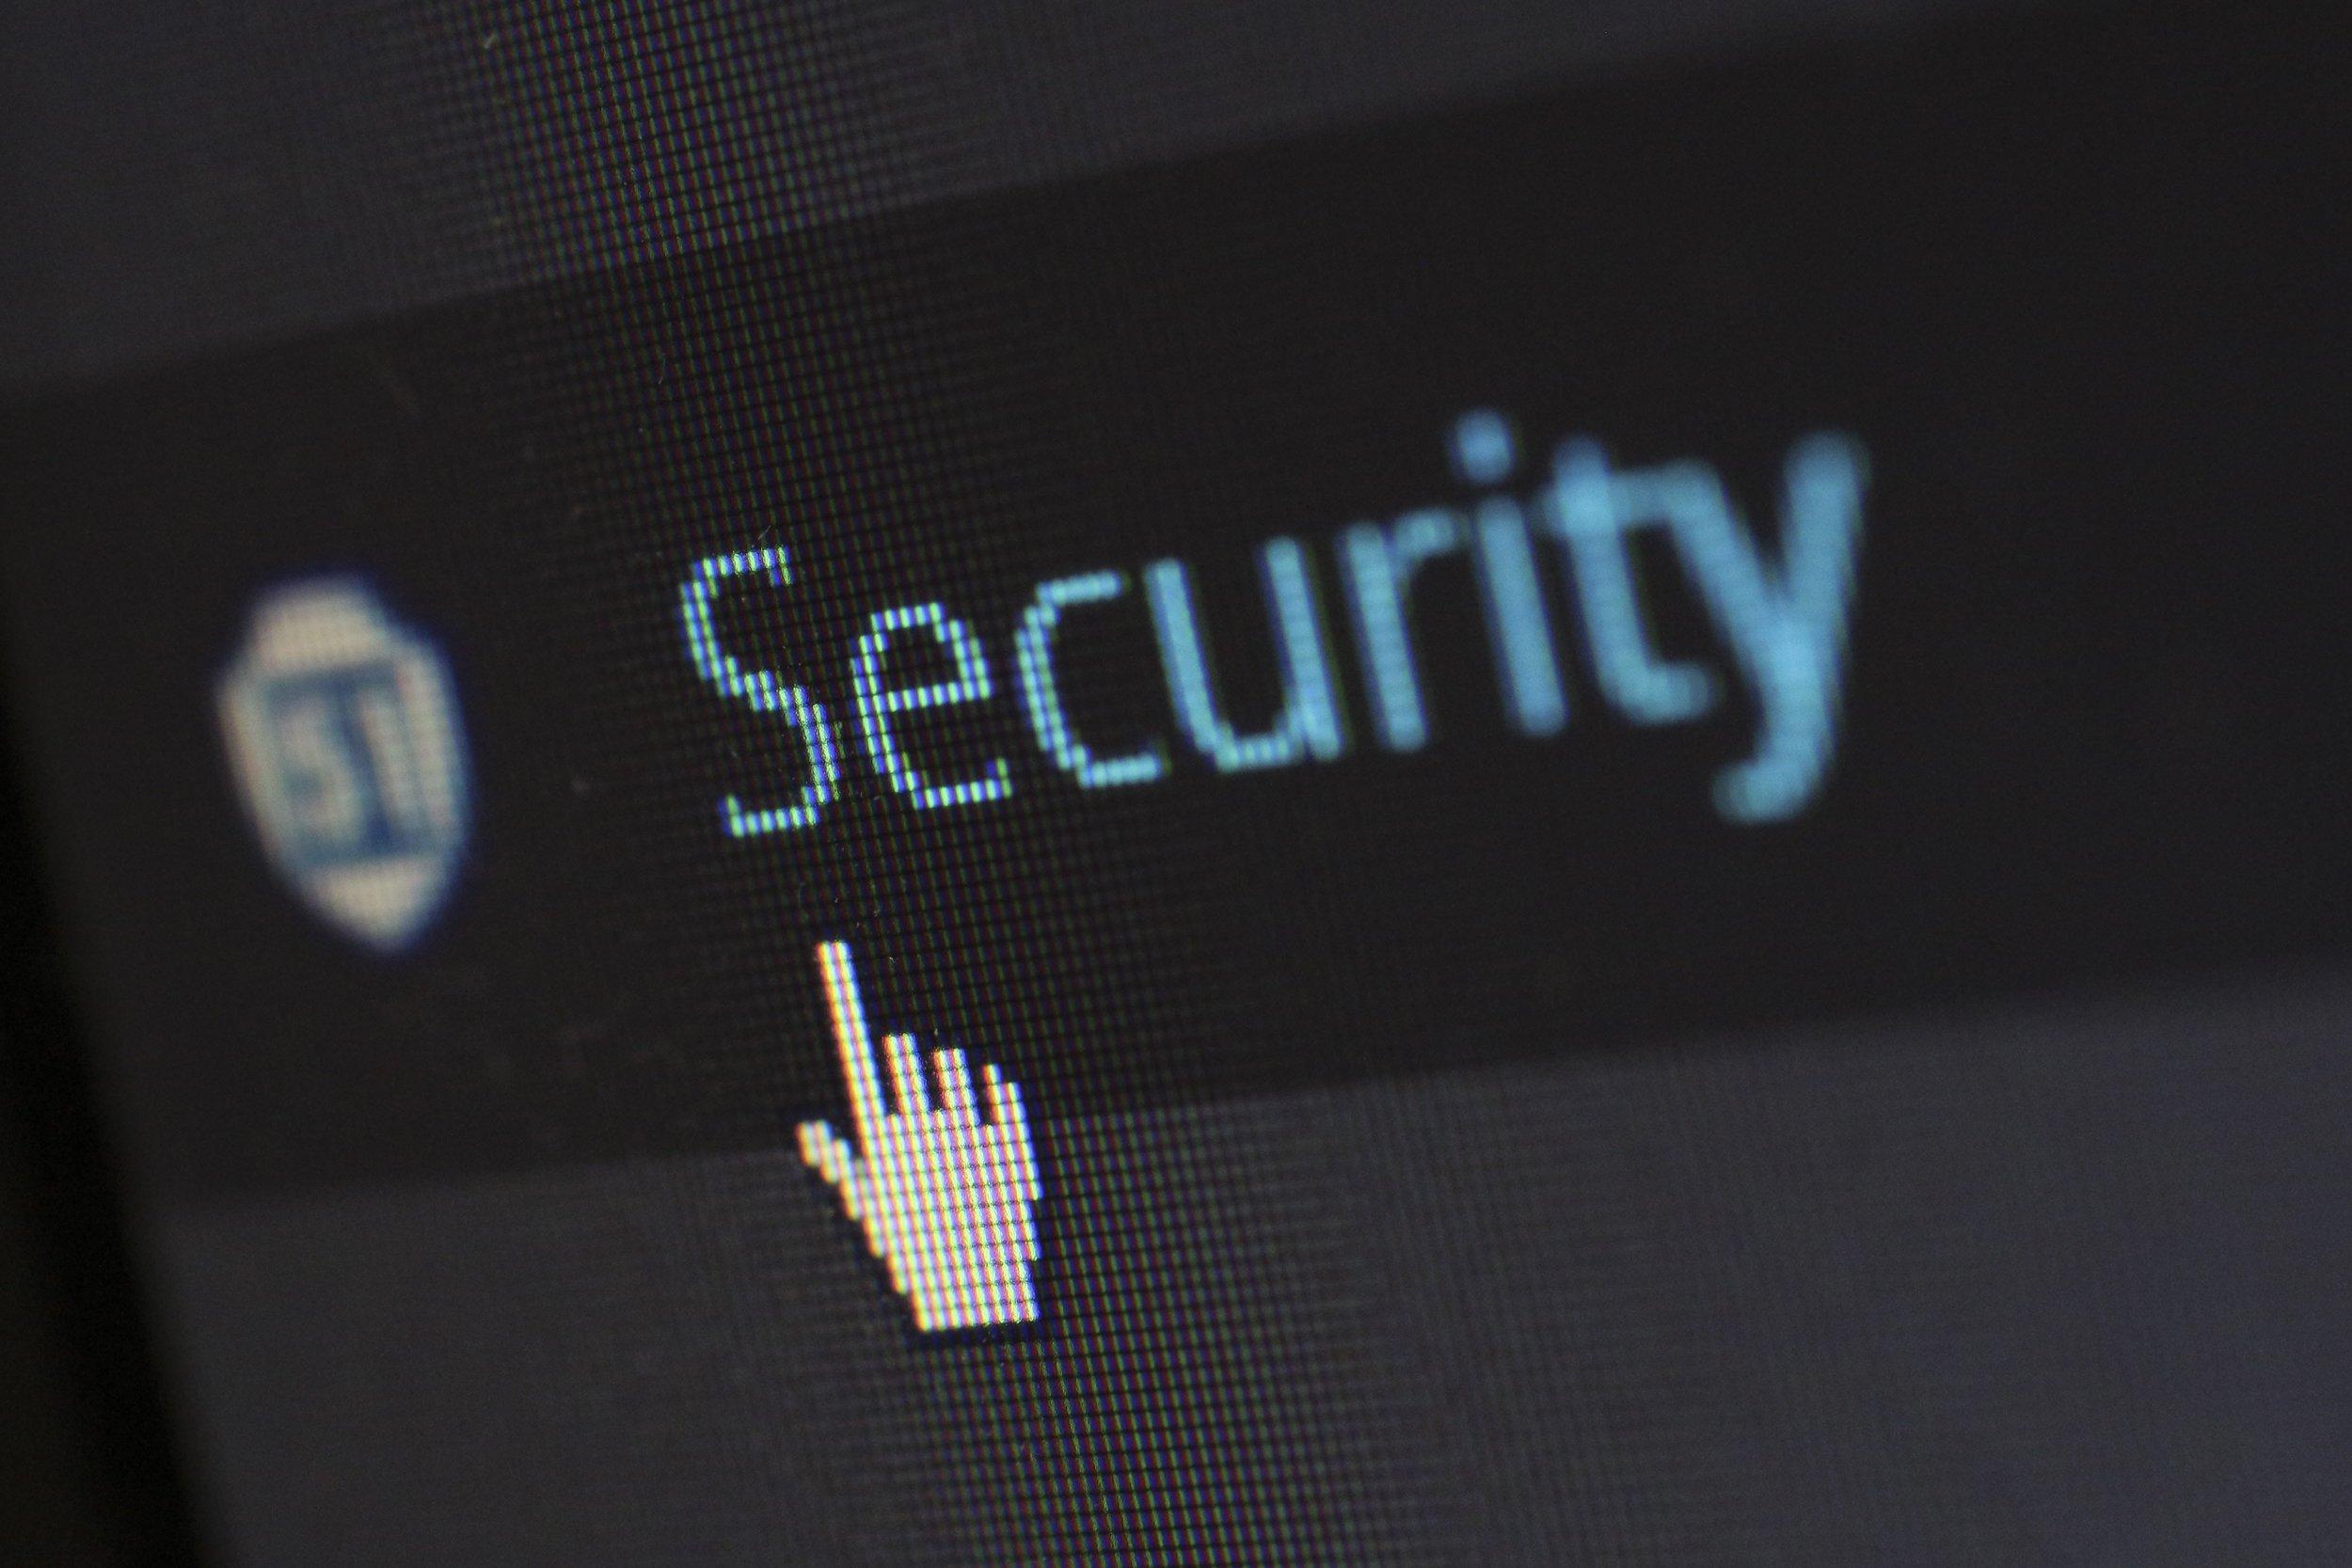 cyber-security-cybersecurity-device-60504.jpg